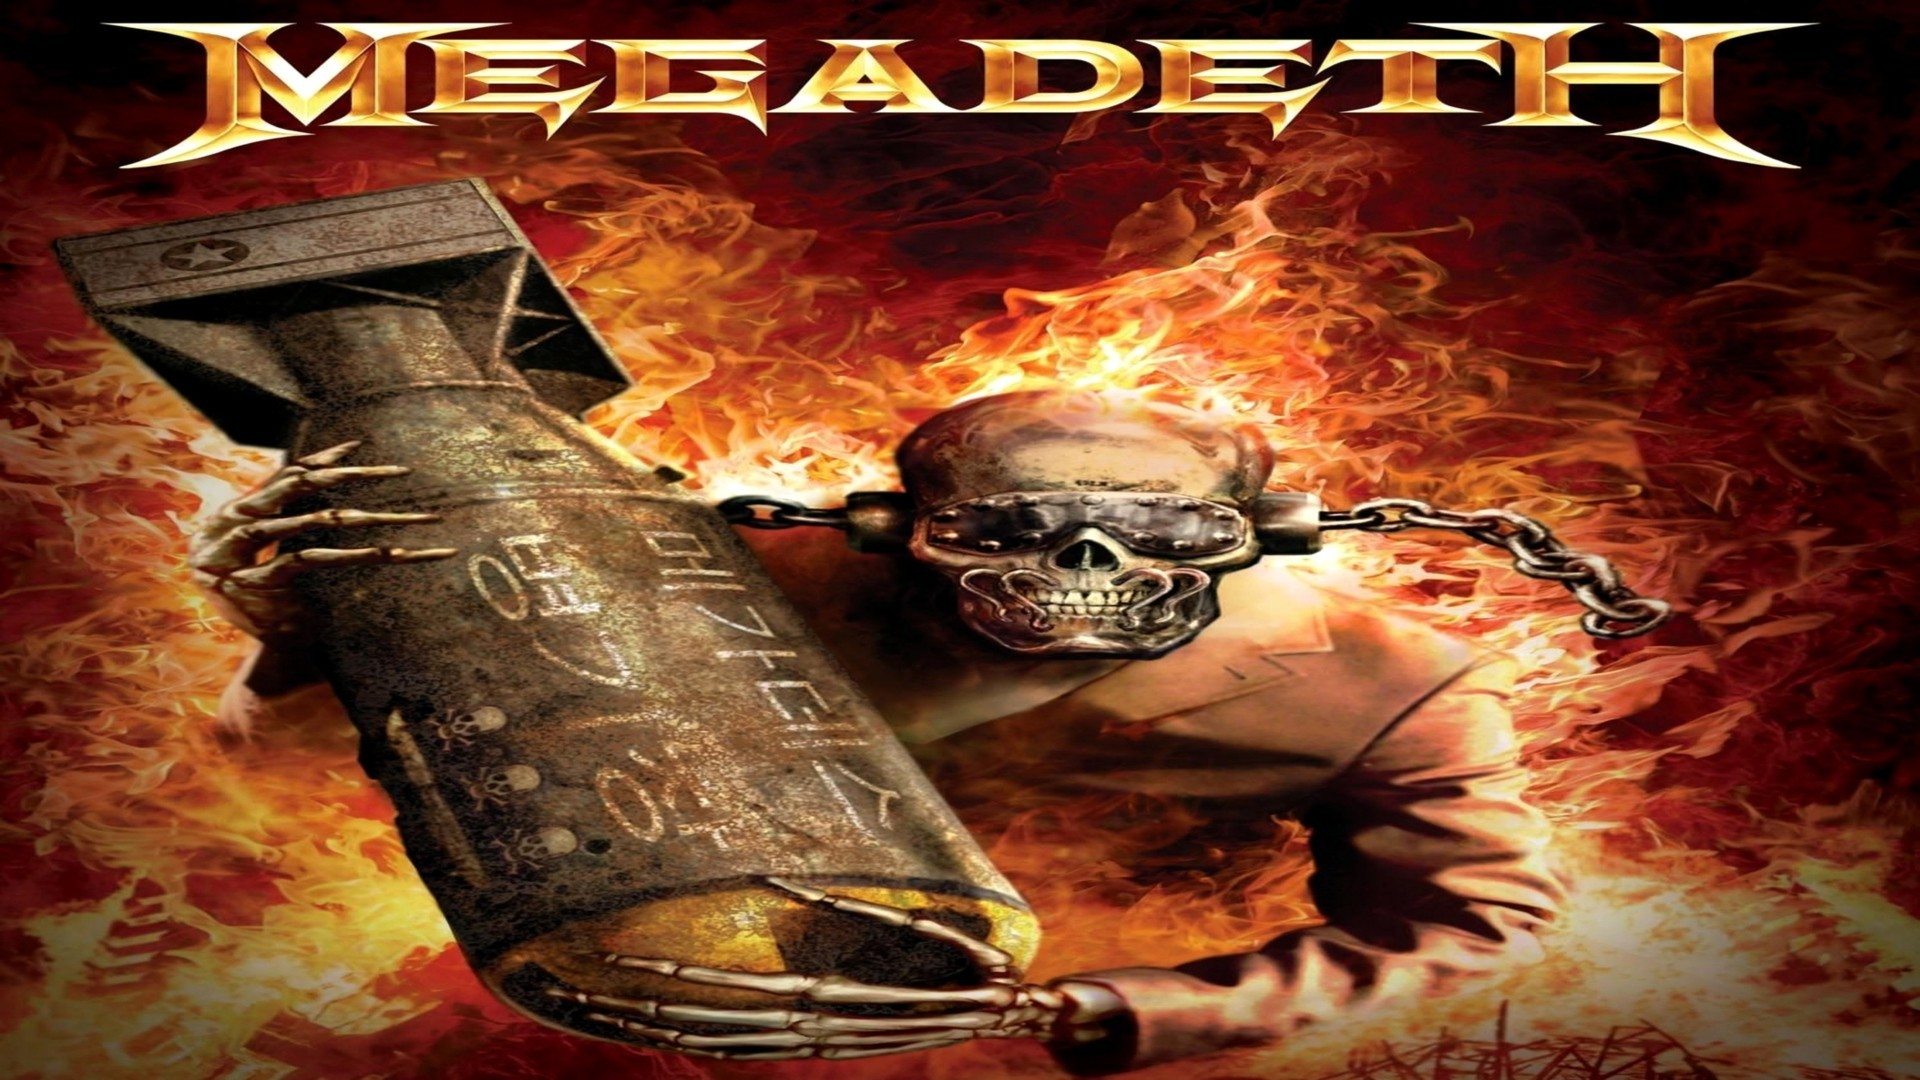 Free Desktop Wallpaper Niagara Falls Megadeth Wallpaper Peace Sells 63 Images